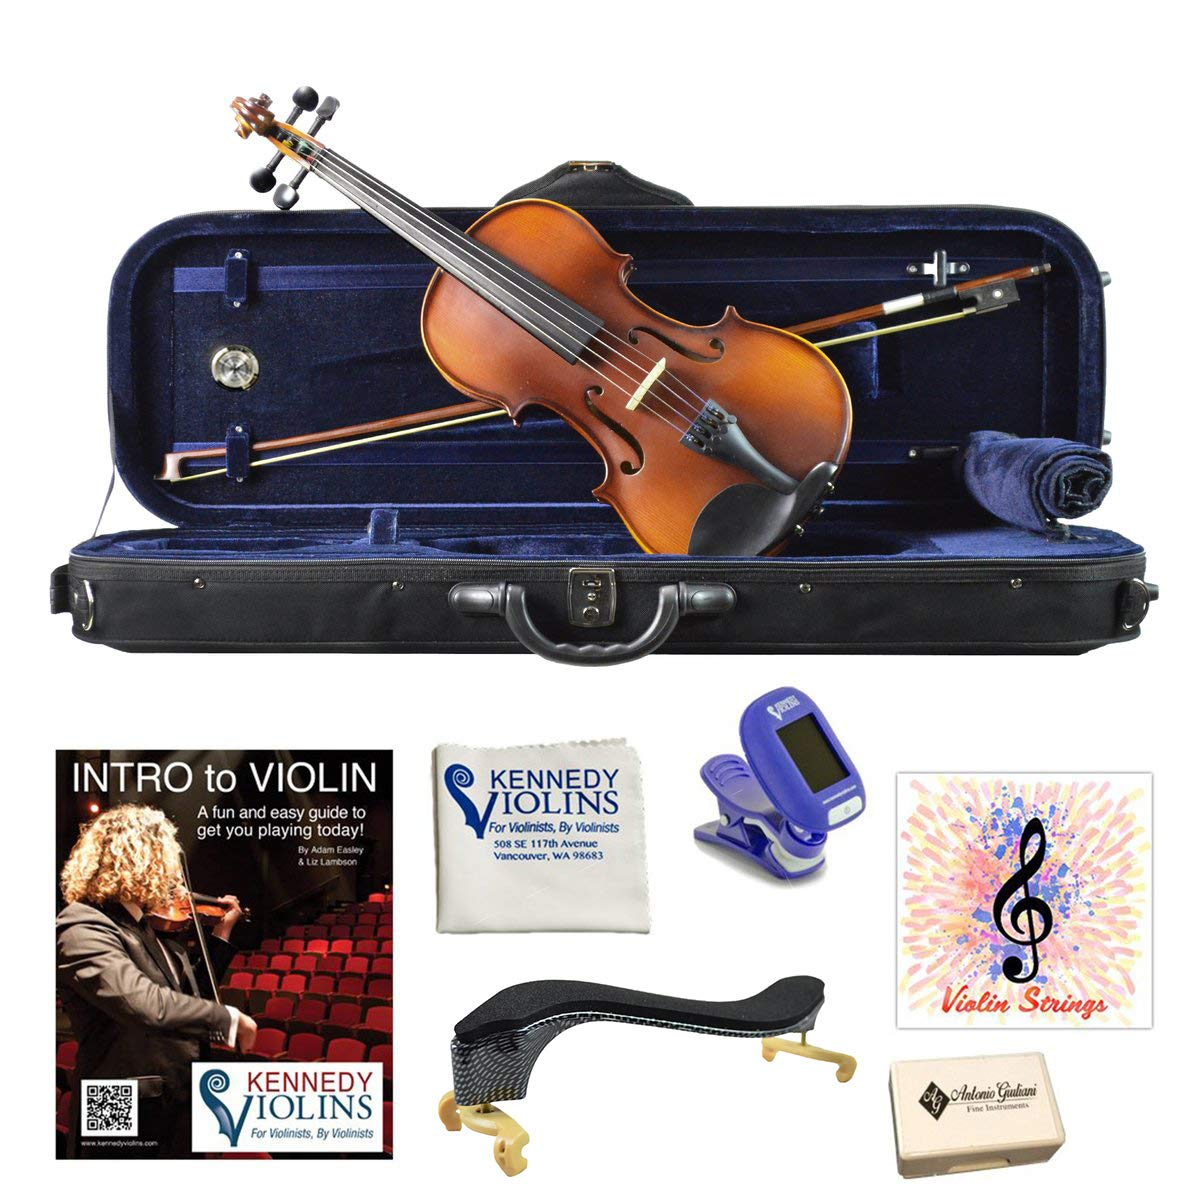 Top 7 Best Violin for Kids Reviews in 2019 3